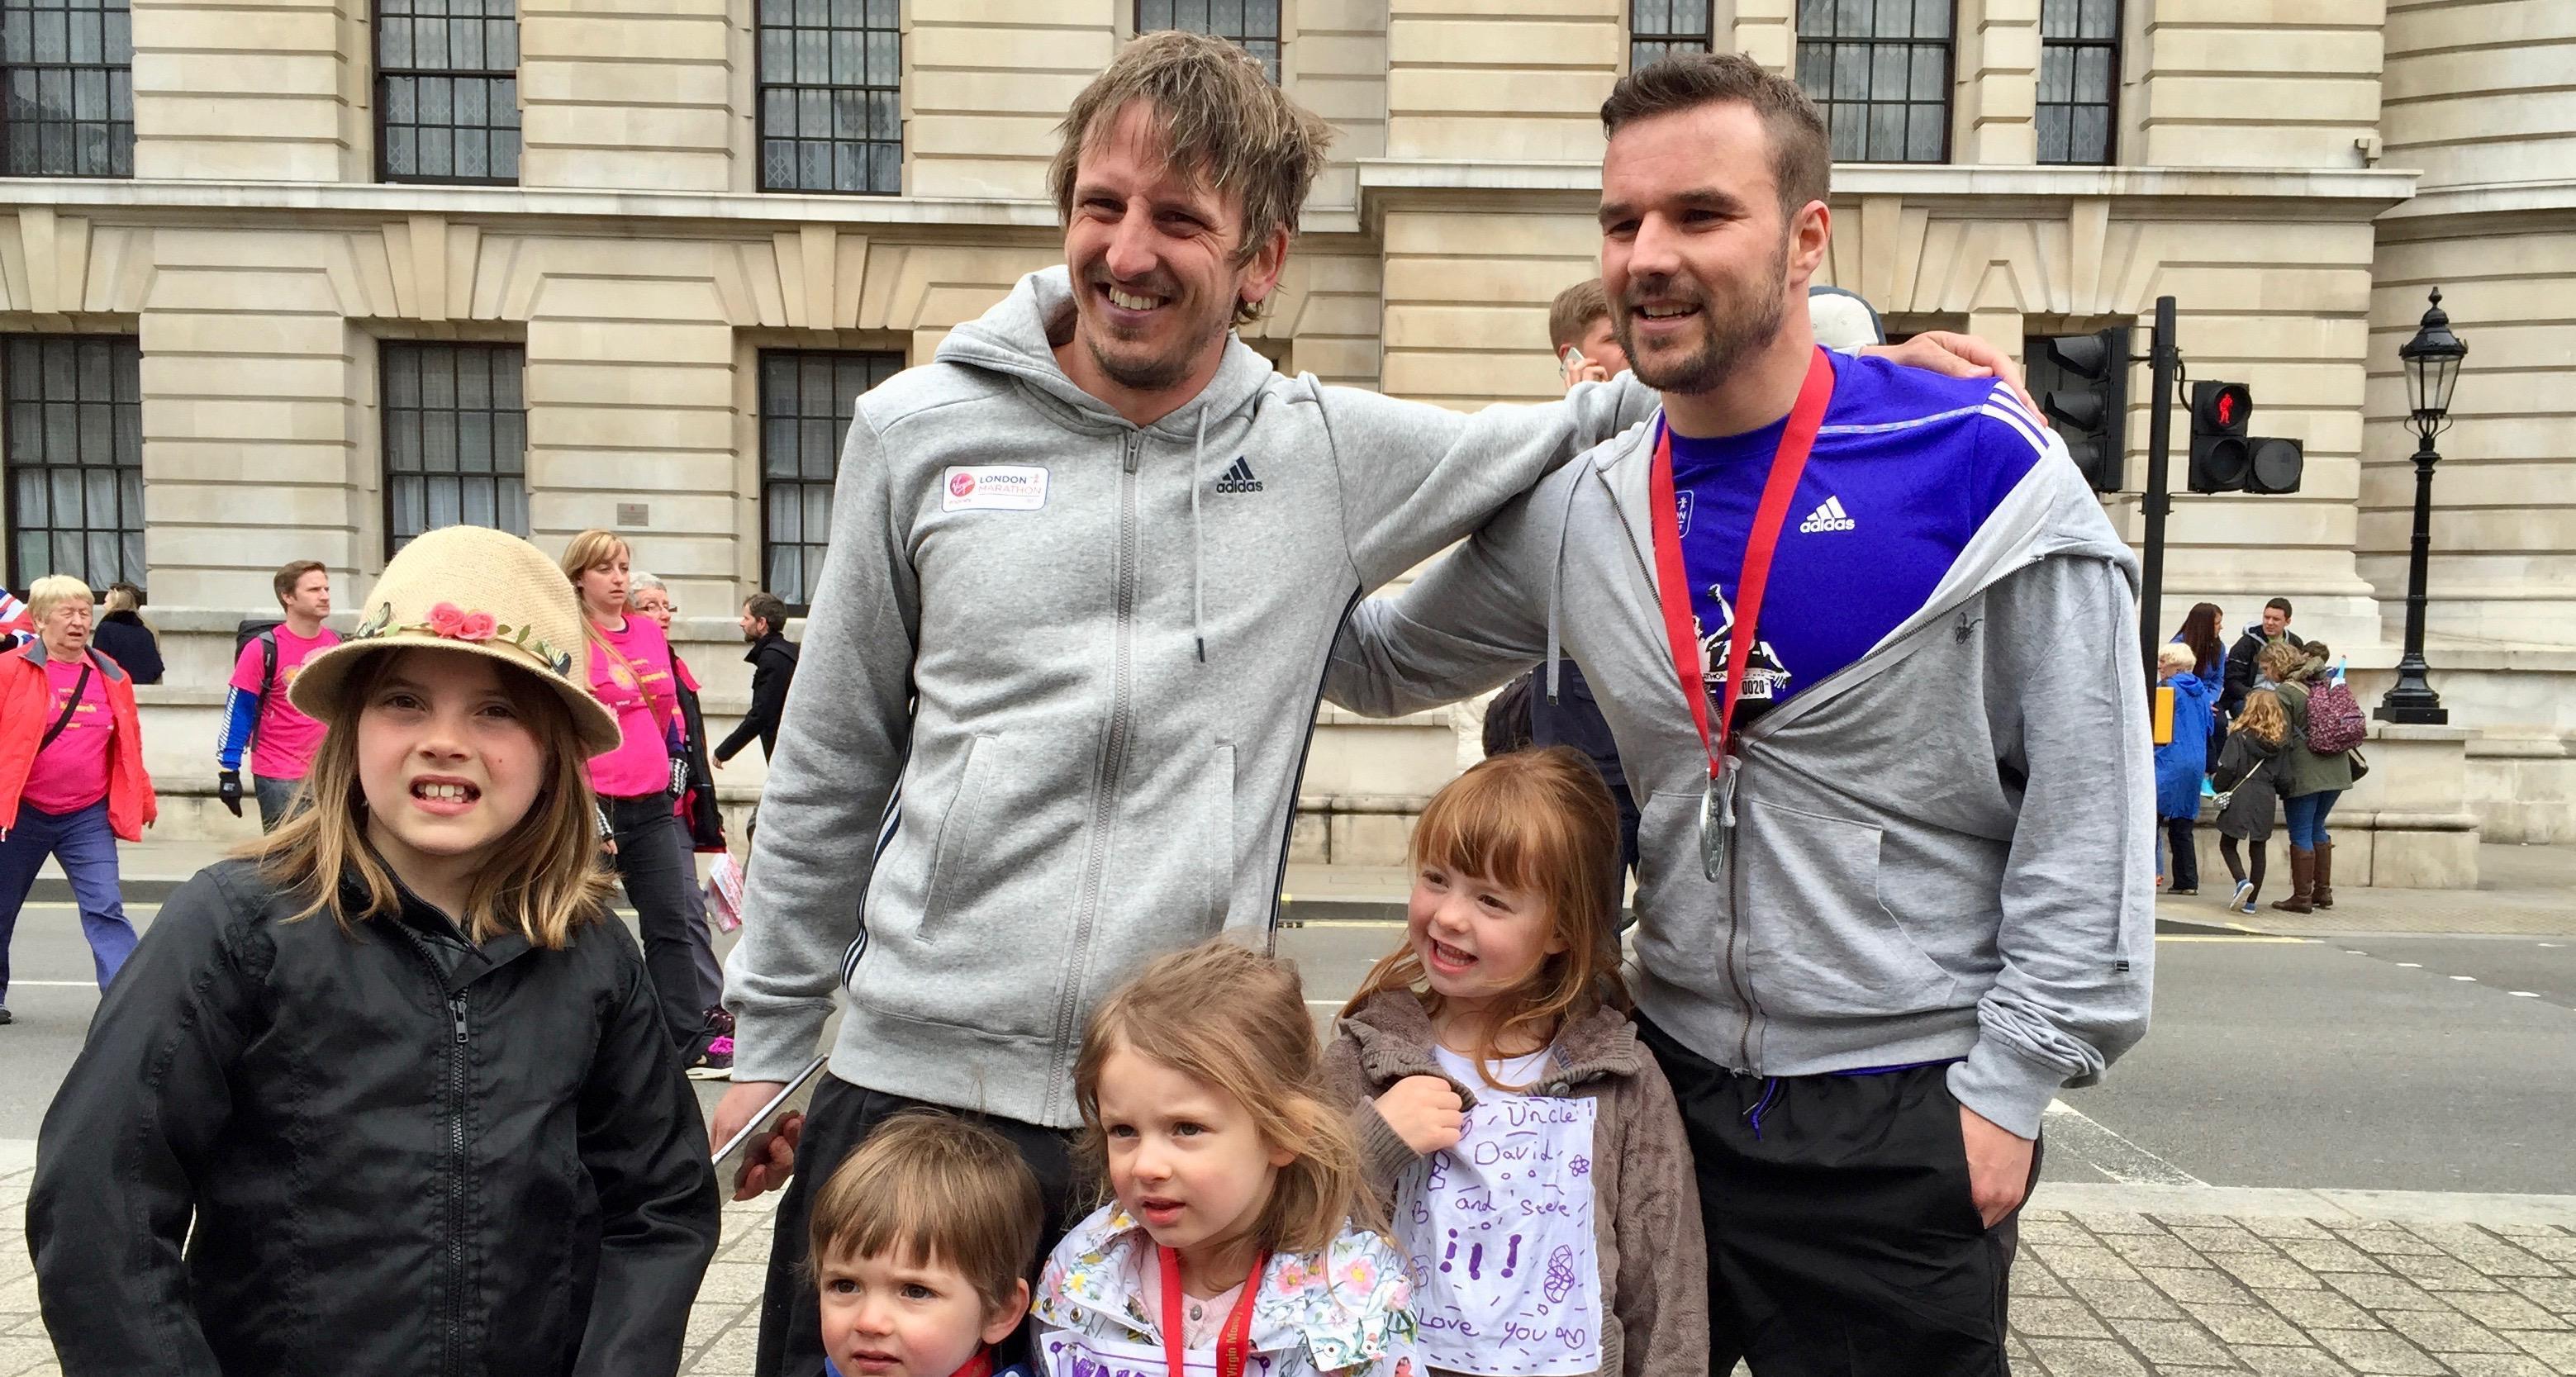 david-kosh-and-stevan-smith-london-marathon-2015